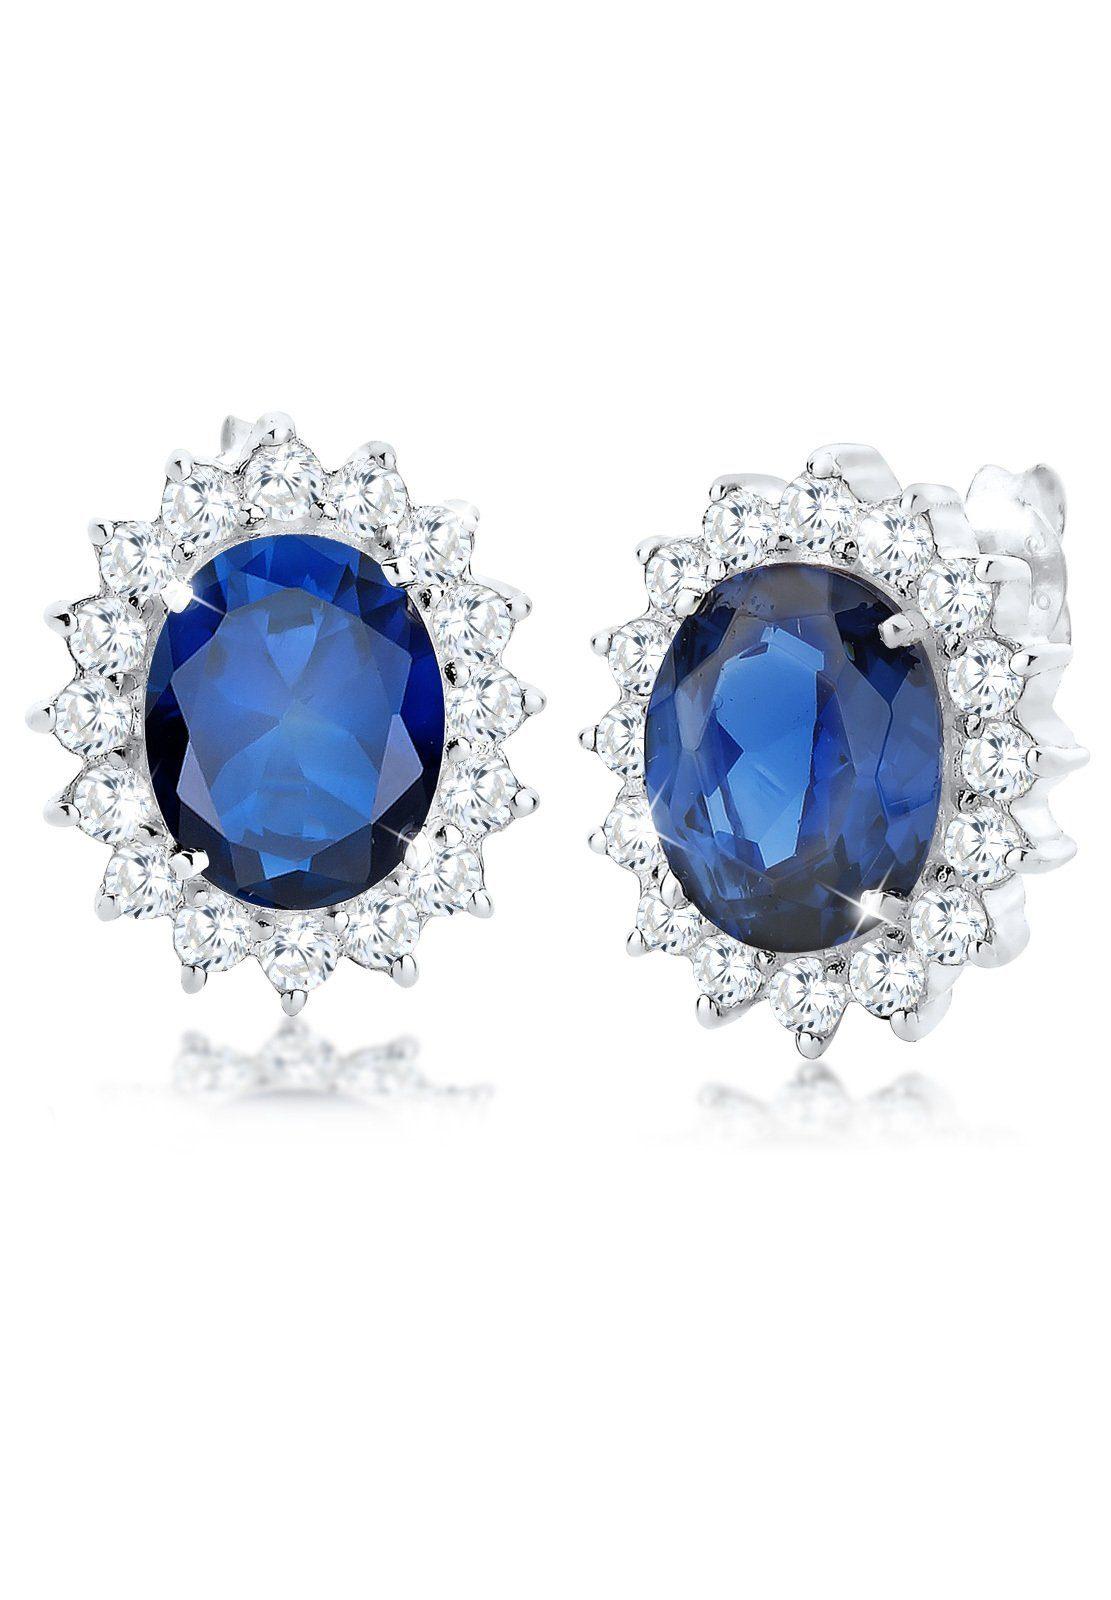 Elli Paar Ohrstecker »Saphirblau Zirkonia Royal Glamour 925 Silber«